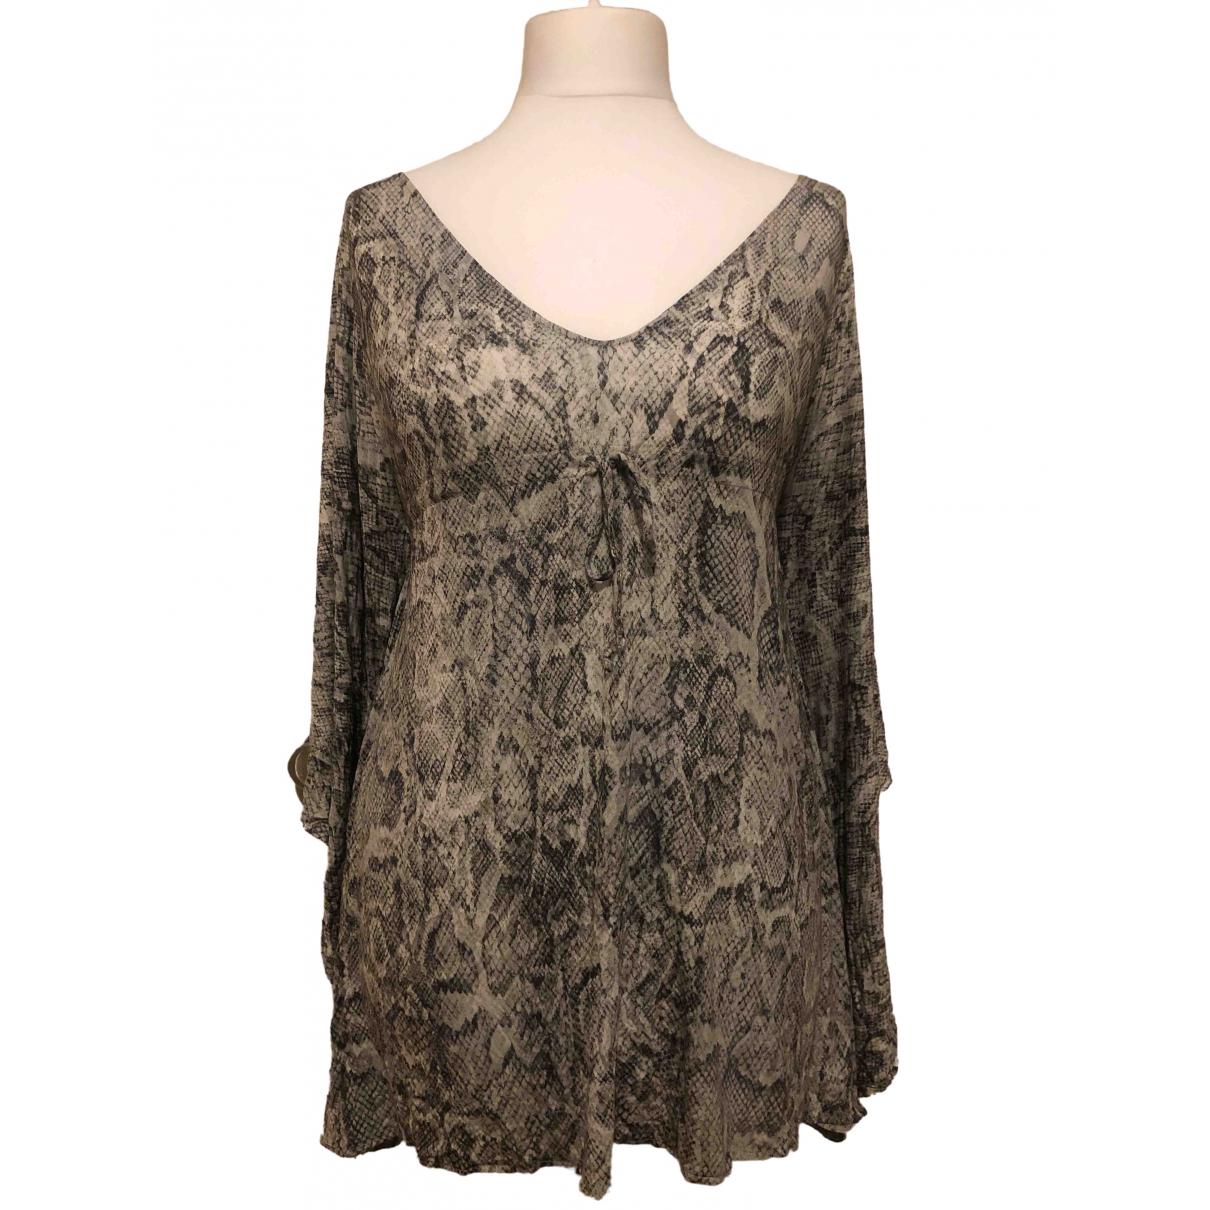 Melissa Odabash \N Grey Cotton - elasthane dress for Women One Size International